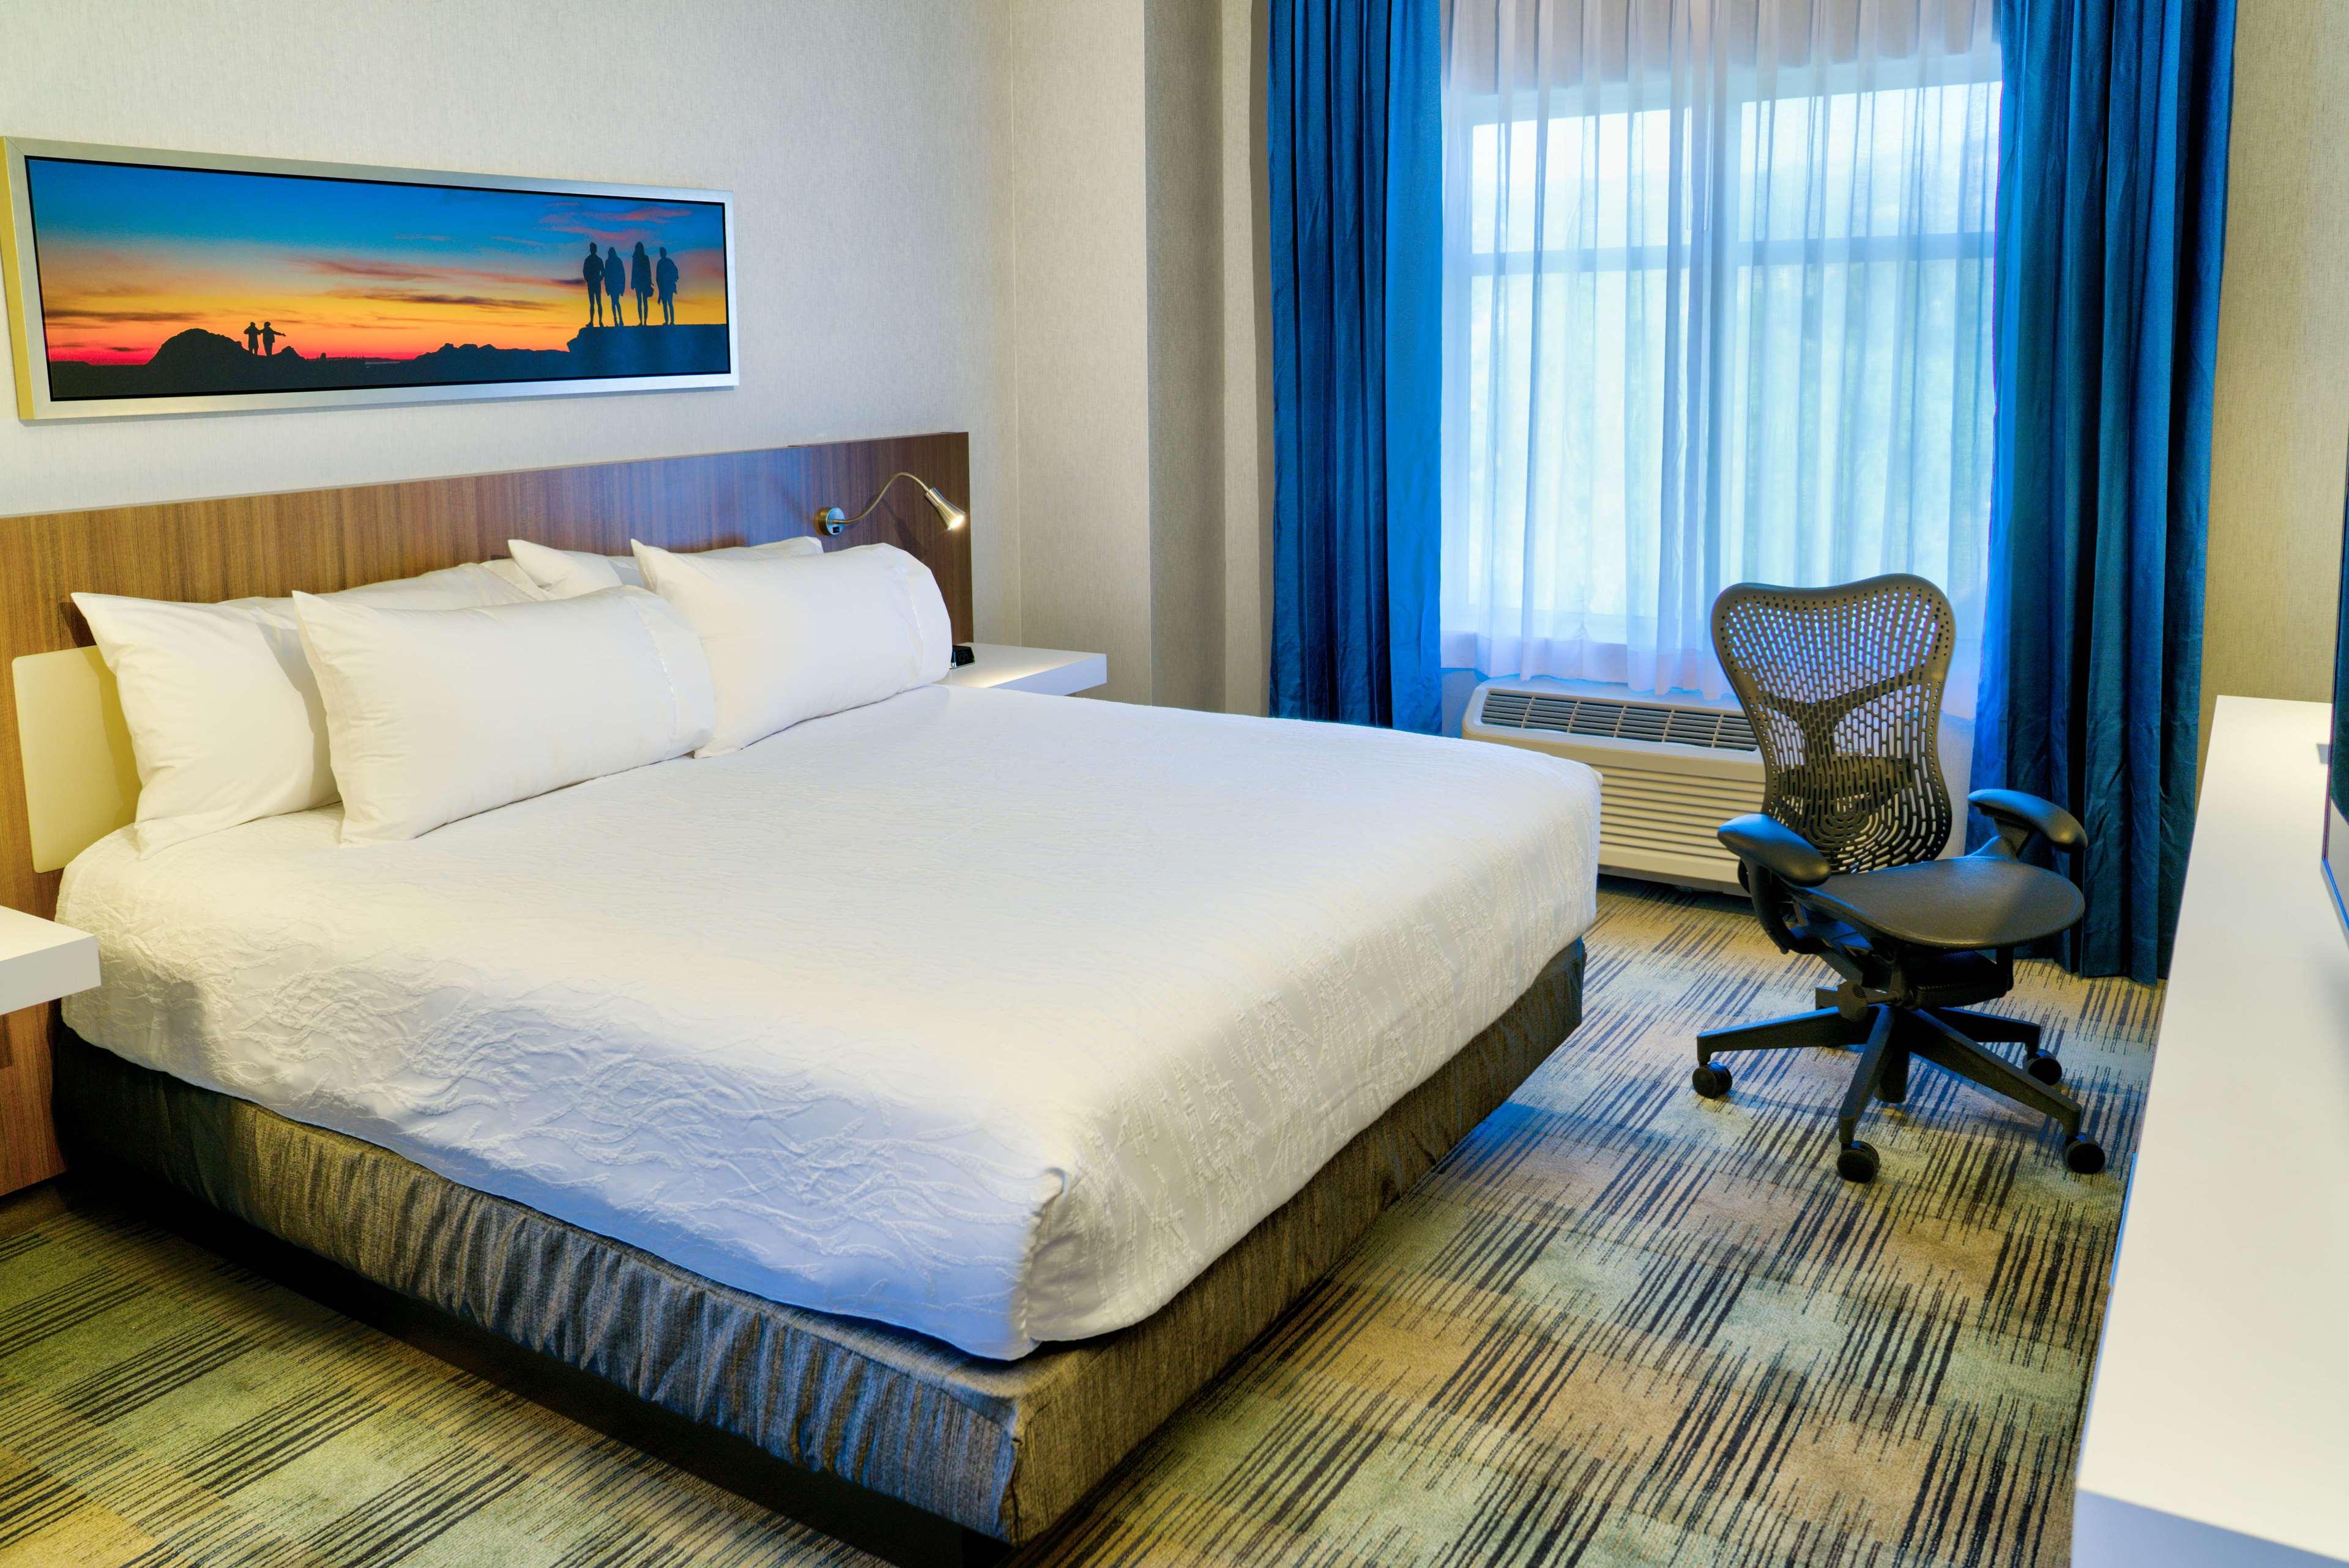 Hilton Garden Inn Santa Barbara/Goleta image 27